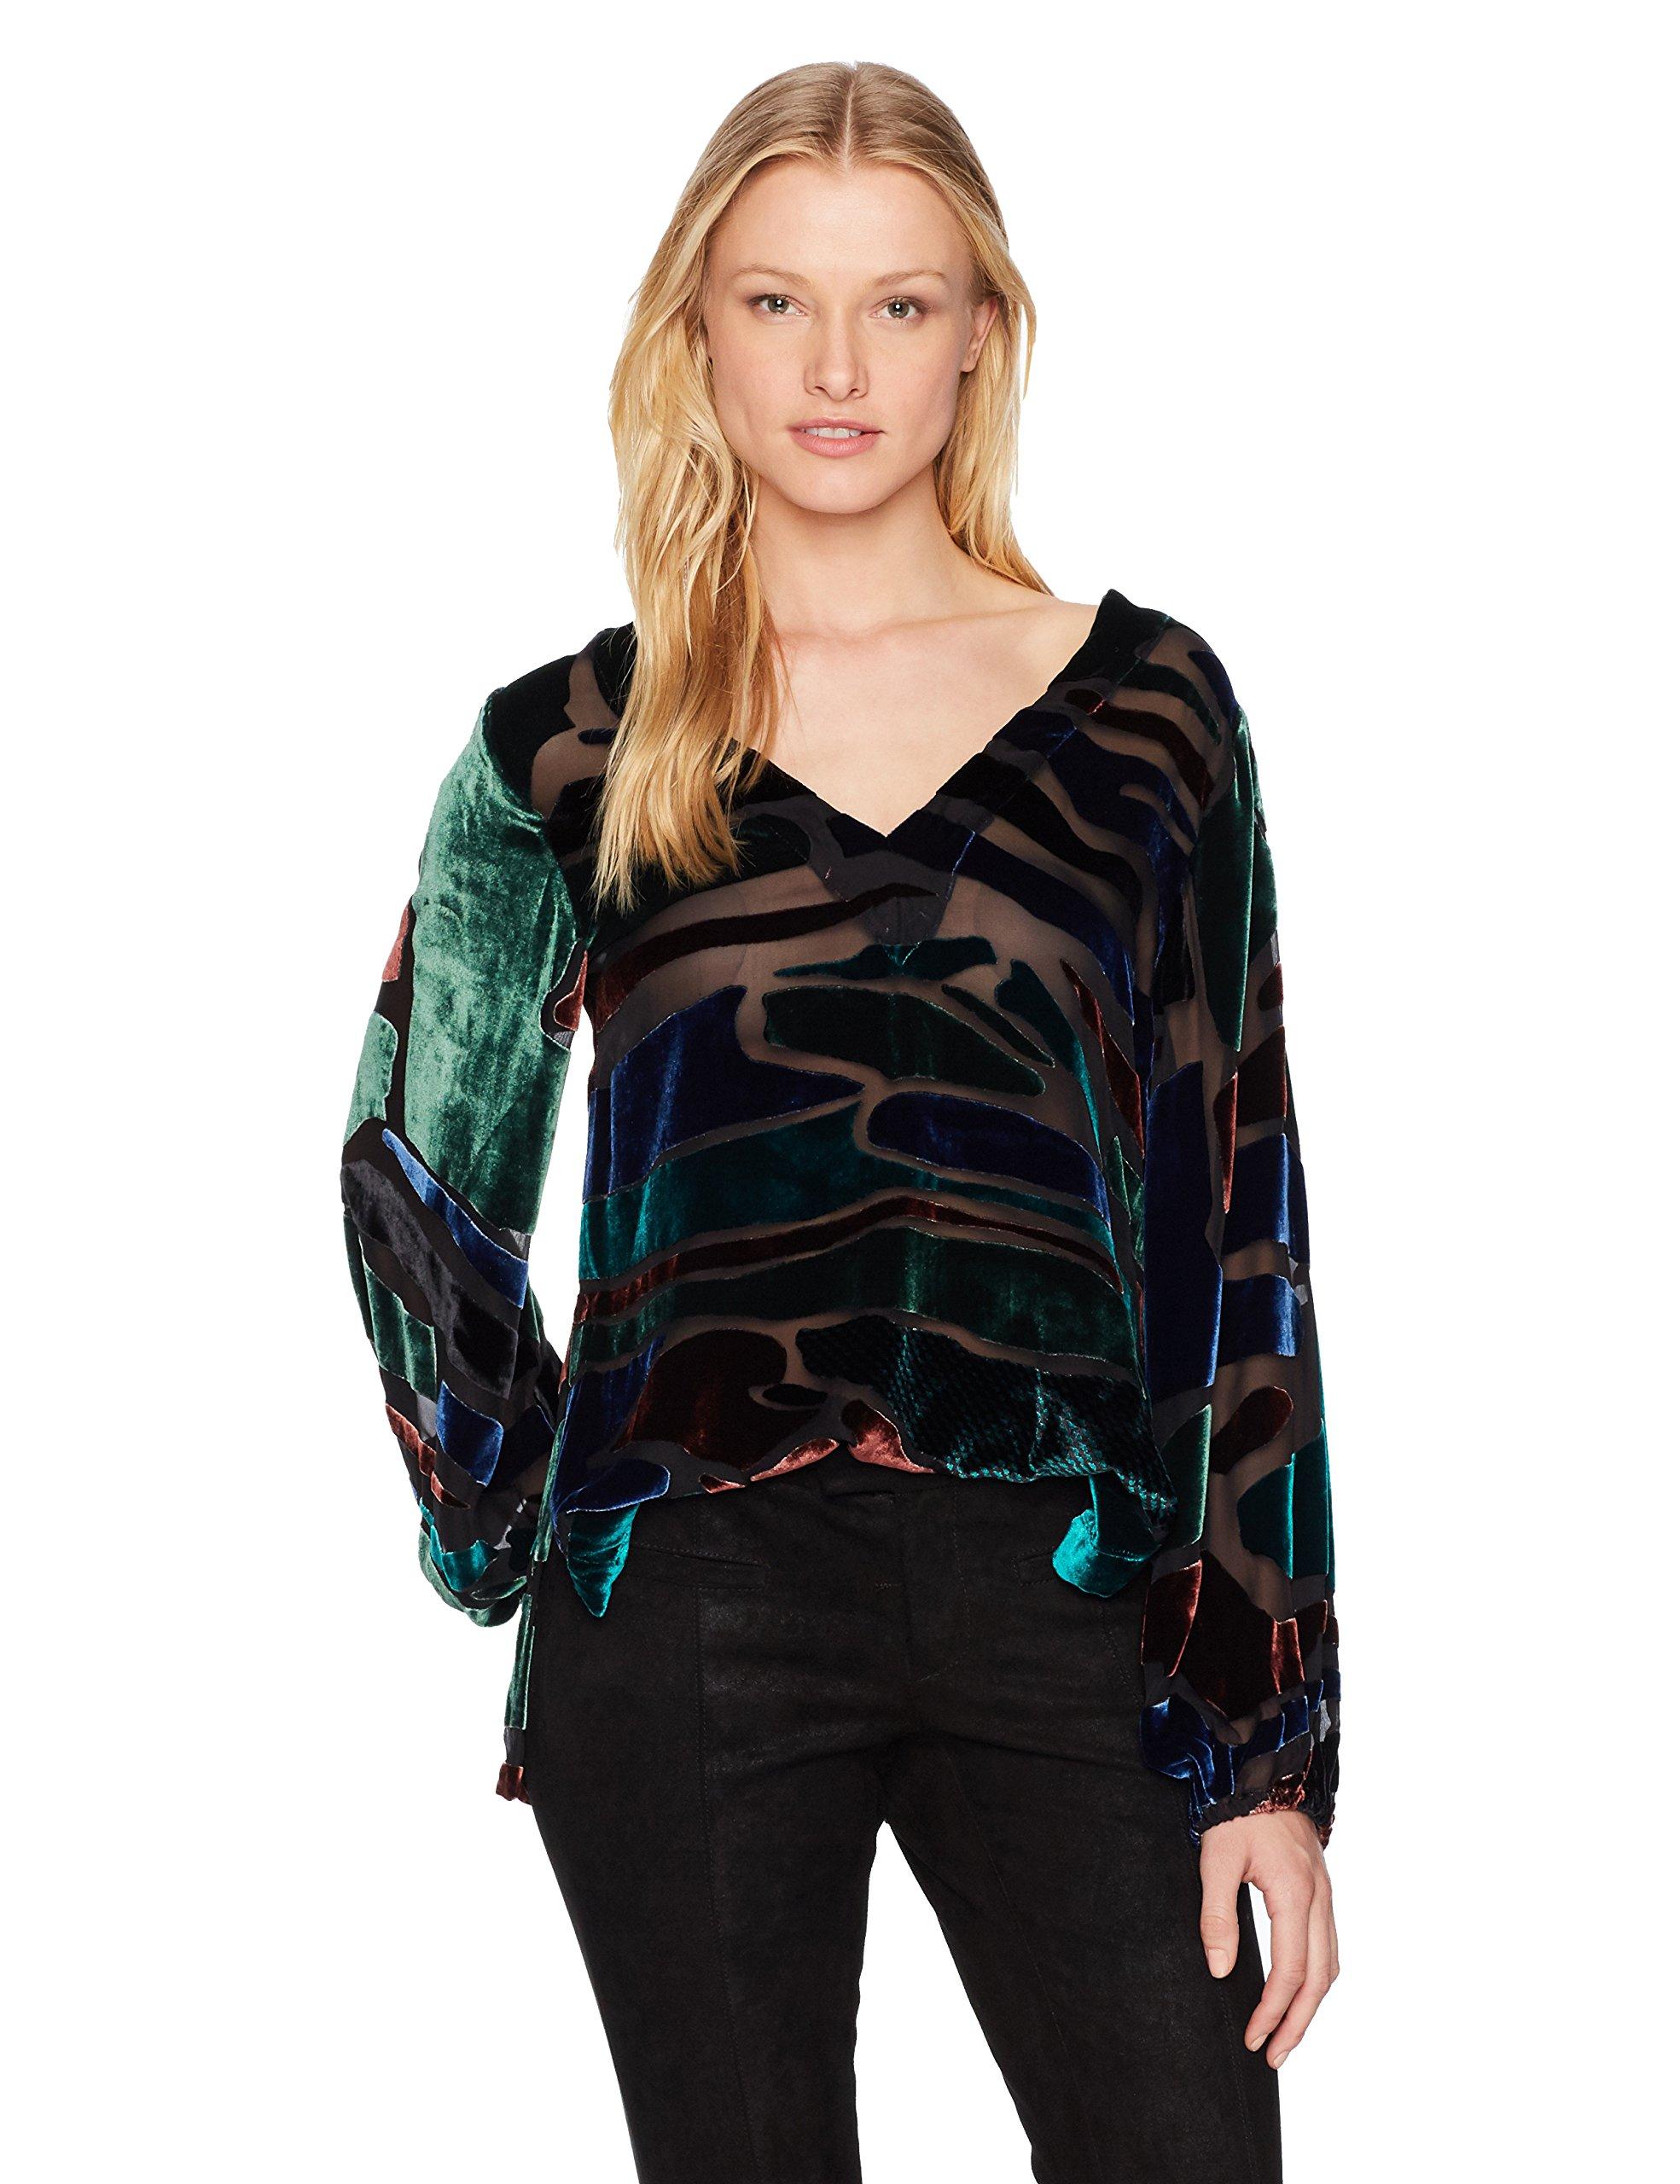 Nicole Miller Women's Penelope Colorblock Velvet Top, Multi, S